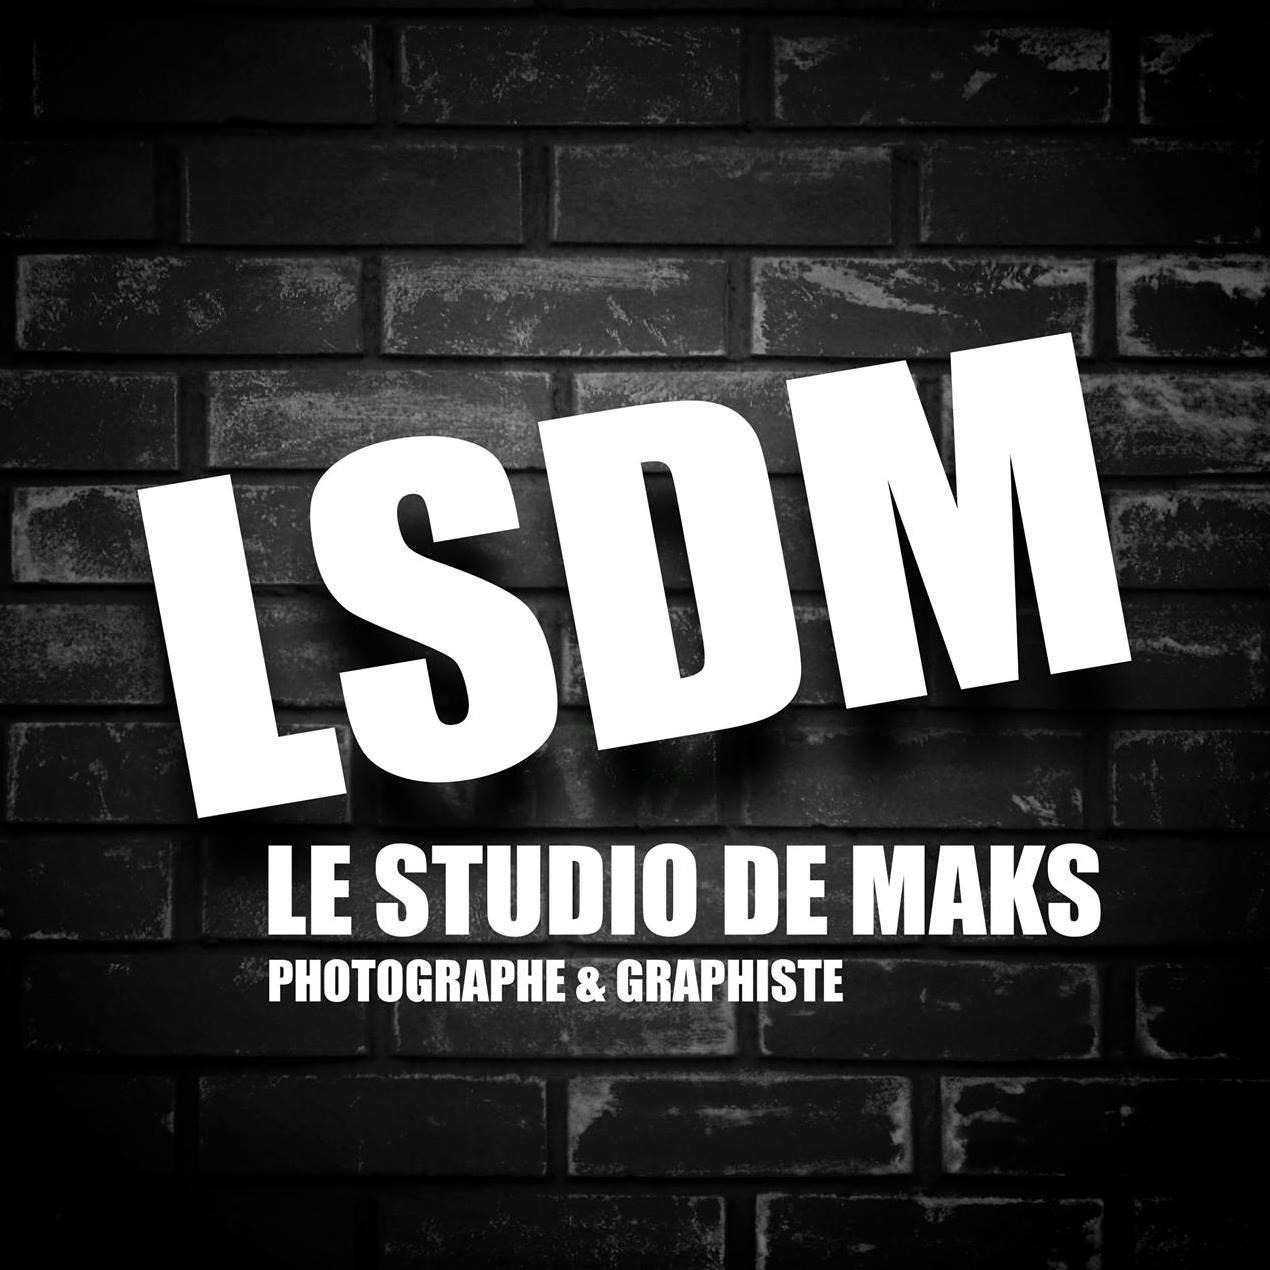 Le Studio de Maks